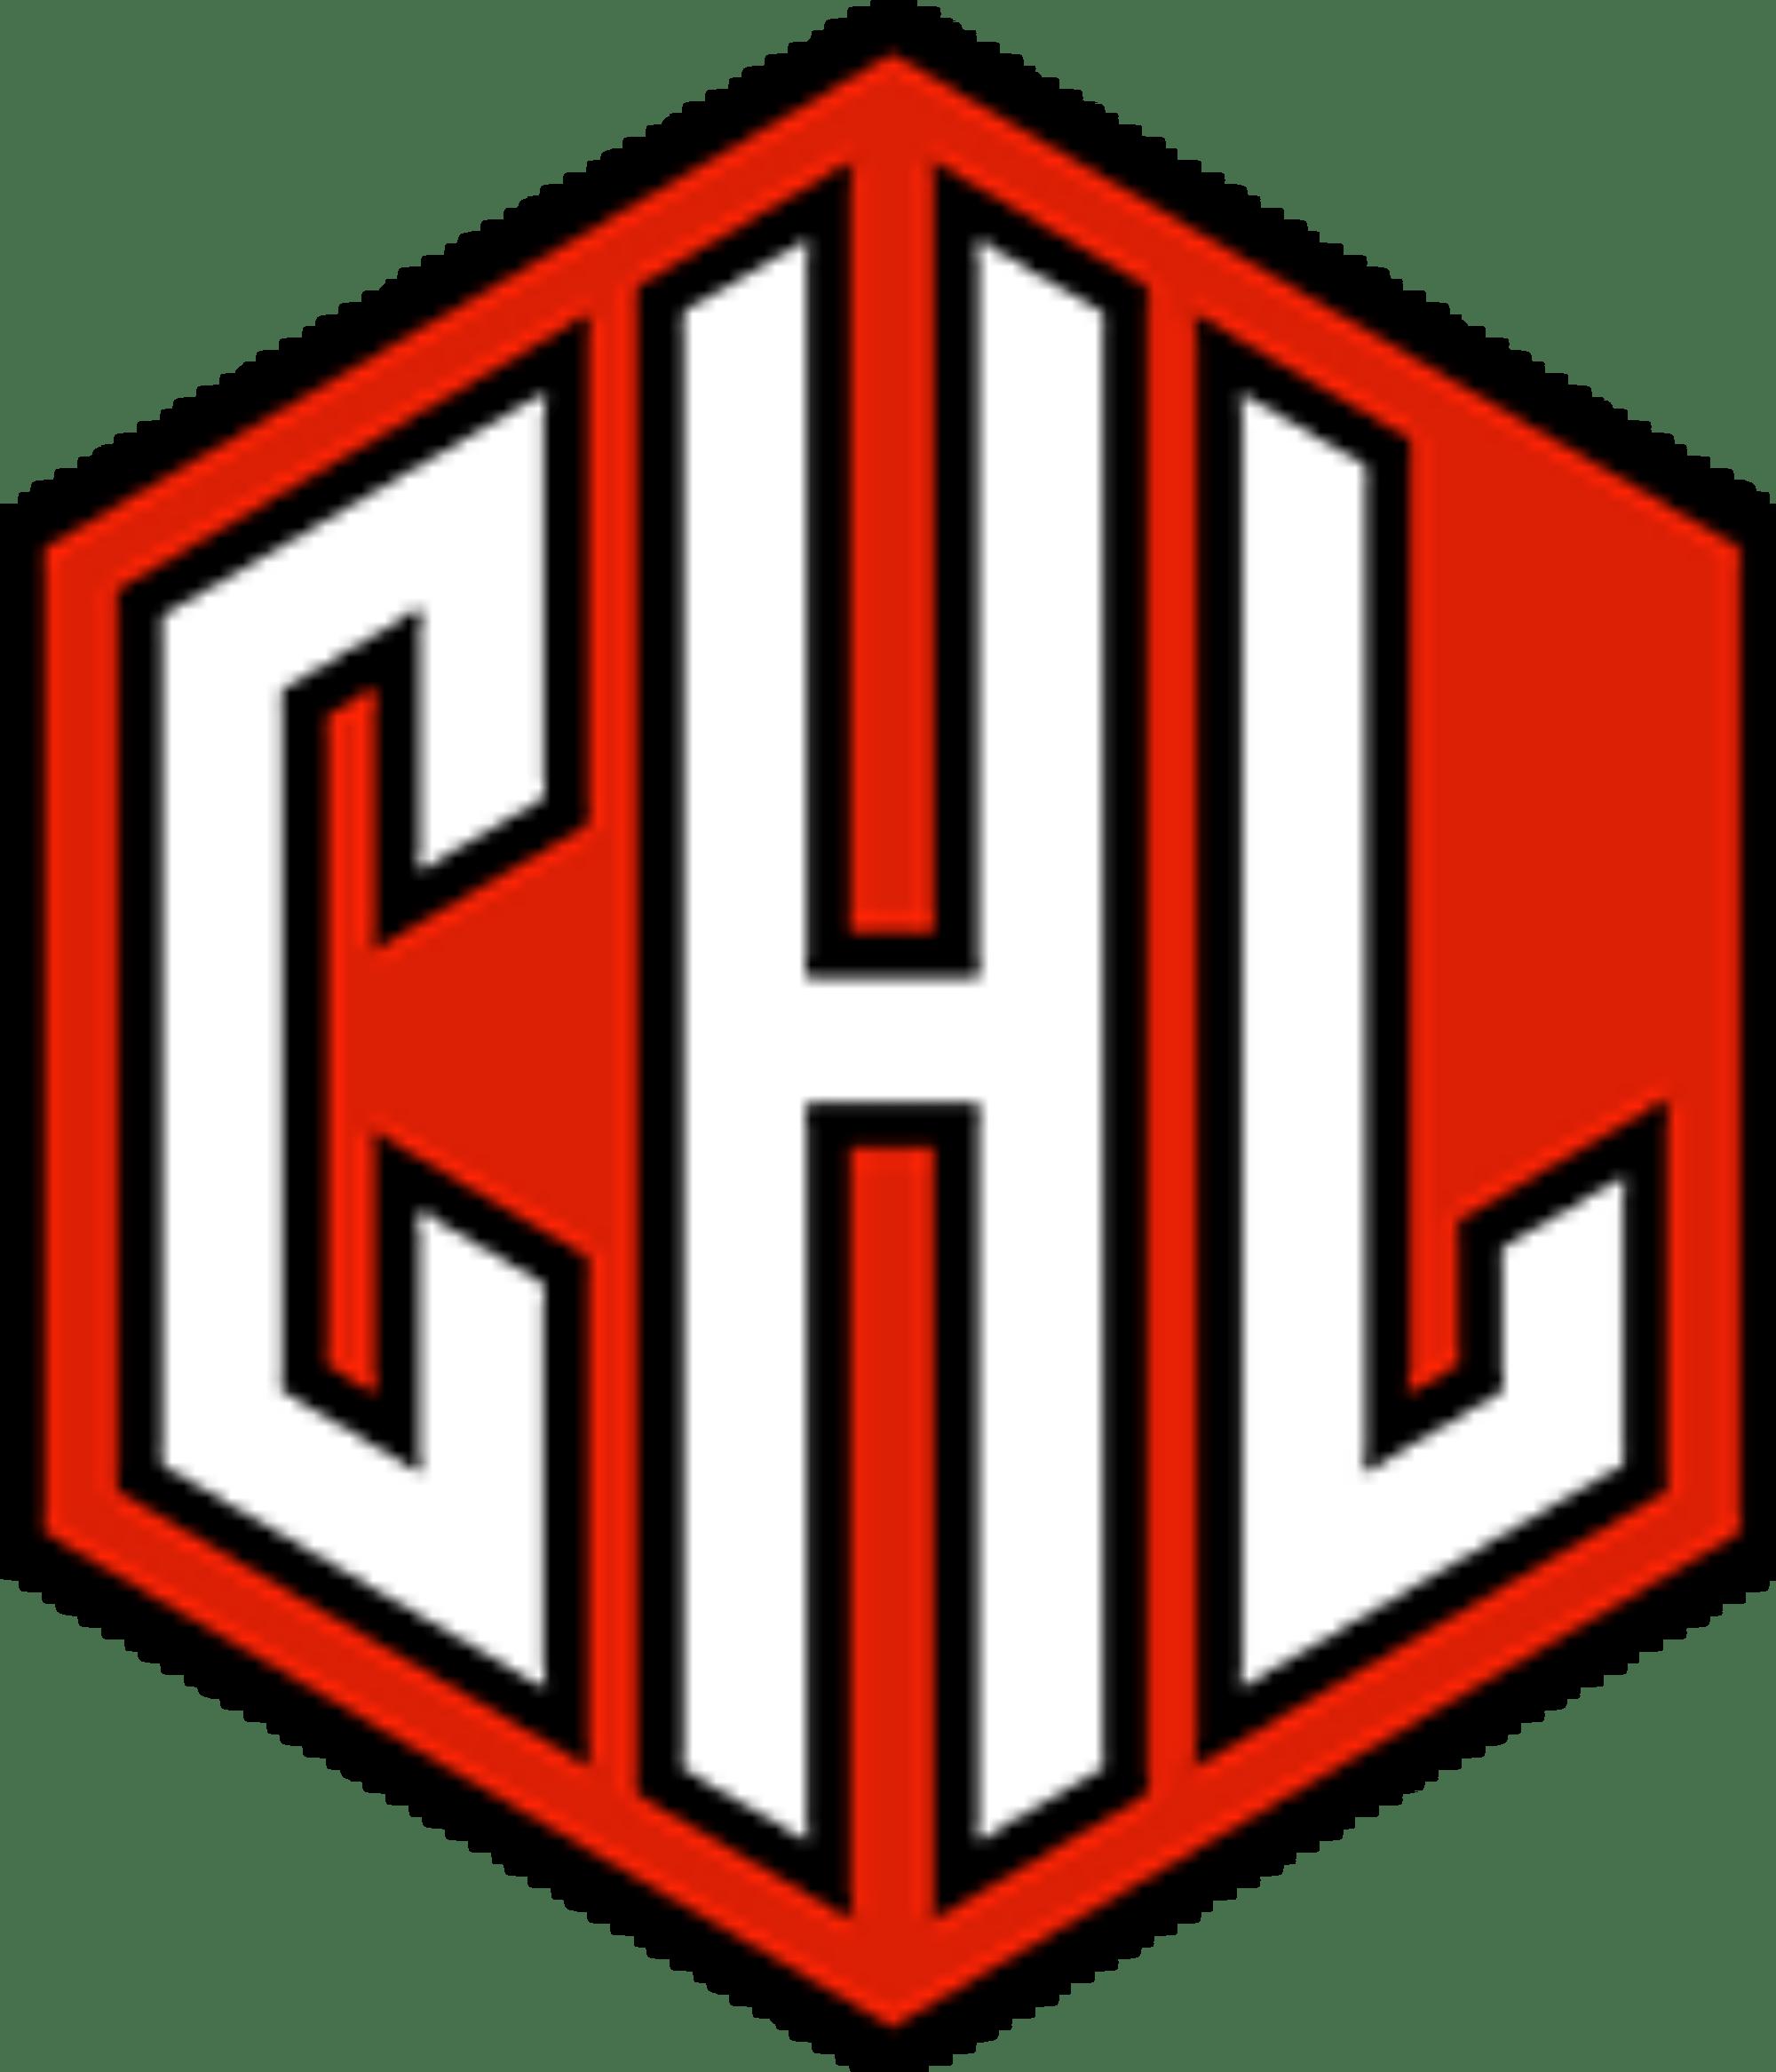 champions hockey league logo transparent png stickpng stickpng